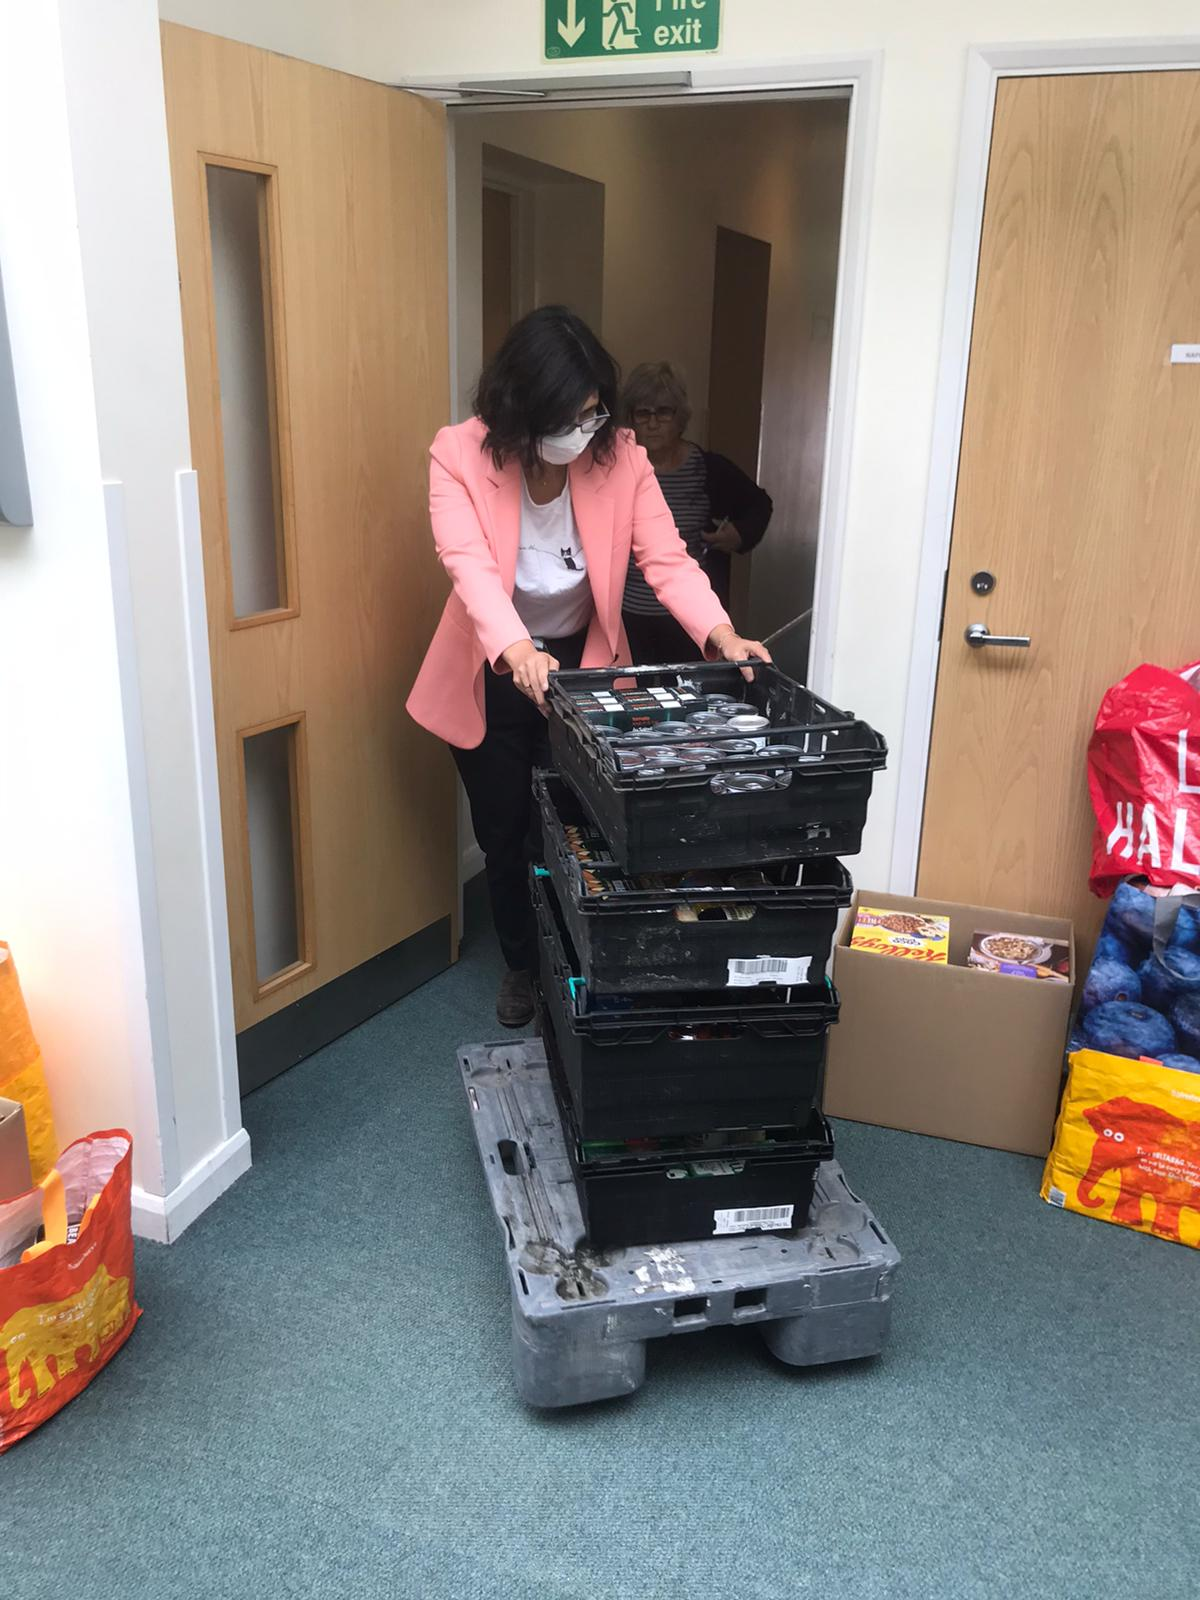 key_Layla Moran_Kidlington Food bank_copyright Layla Moran MP